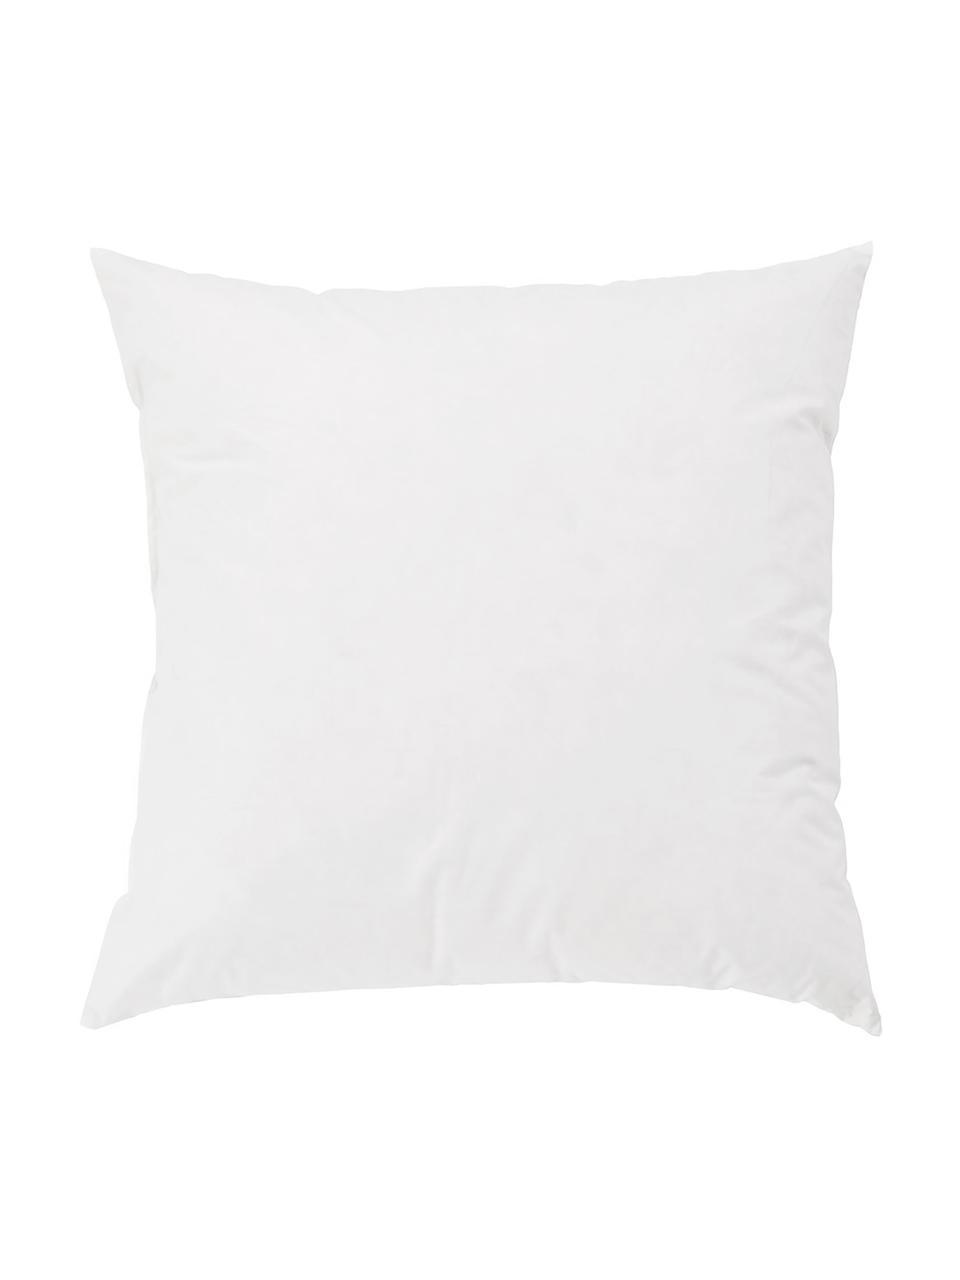 Imbottitura per cuscino in piume Comfort, 45 x 45, Bianco, Larg. 45 x Lung. 45 cm